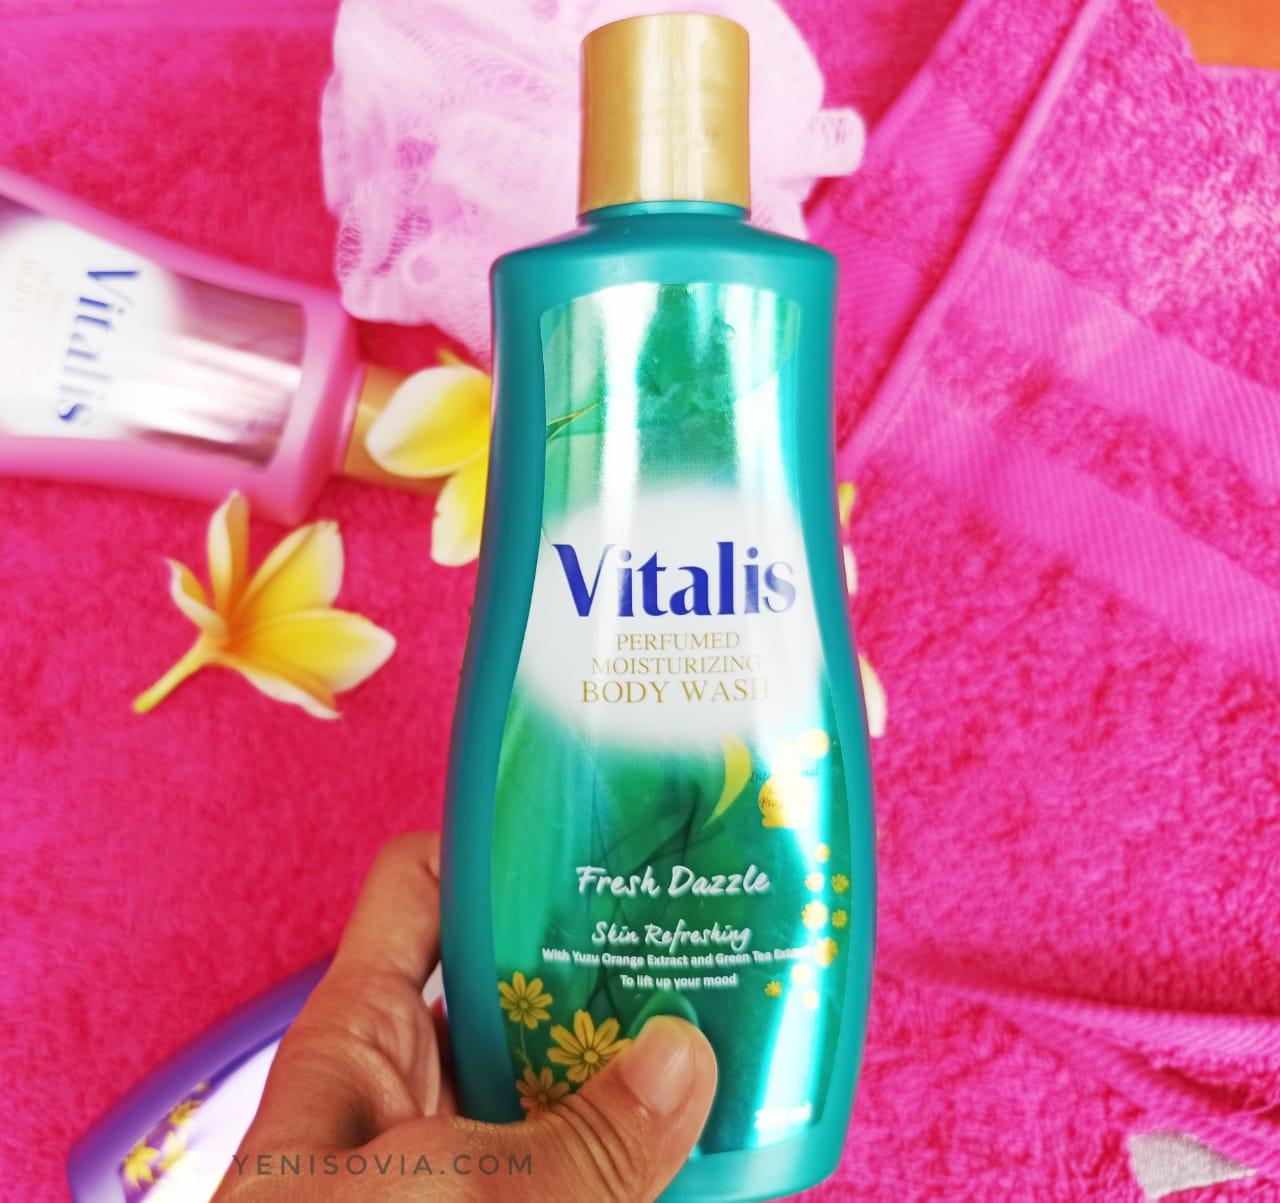 Vitalis Fresh dazzle